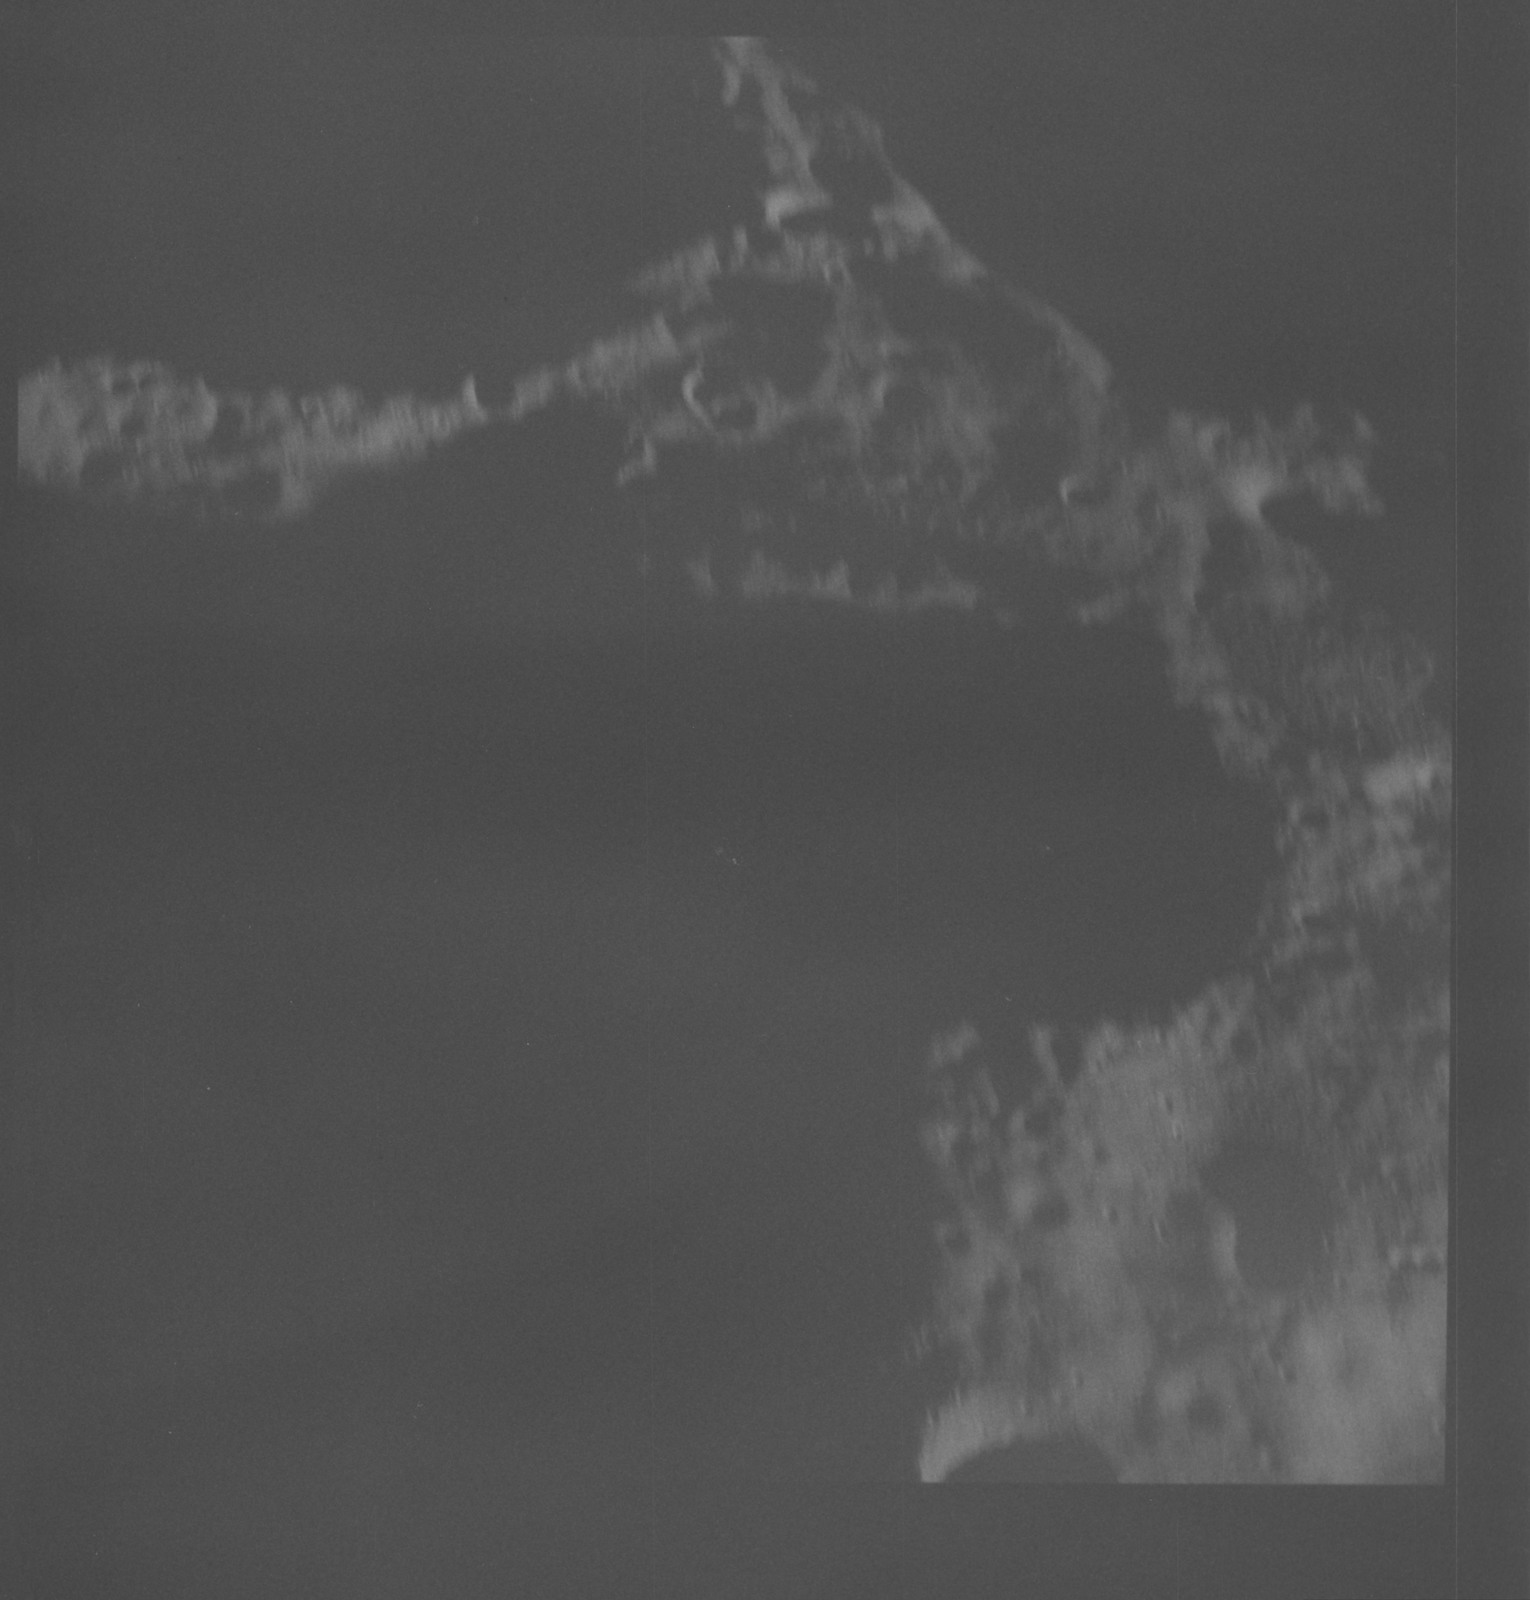 AS08-18-2829 - Apollo 8 - Apollo 8 Mission image, Moon, Farside, Terminator